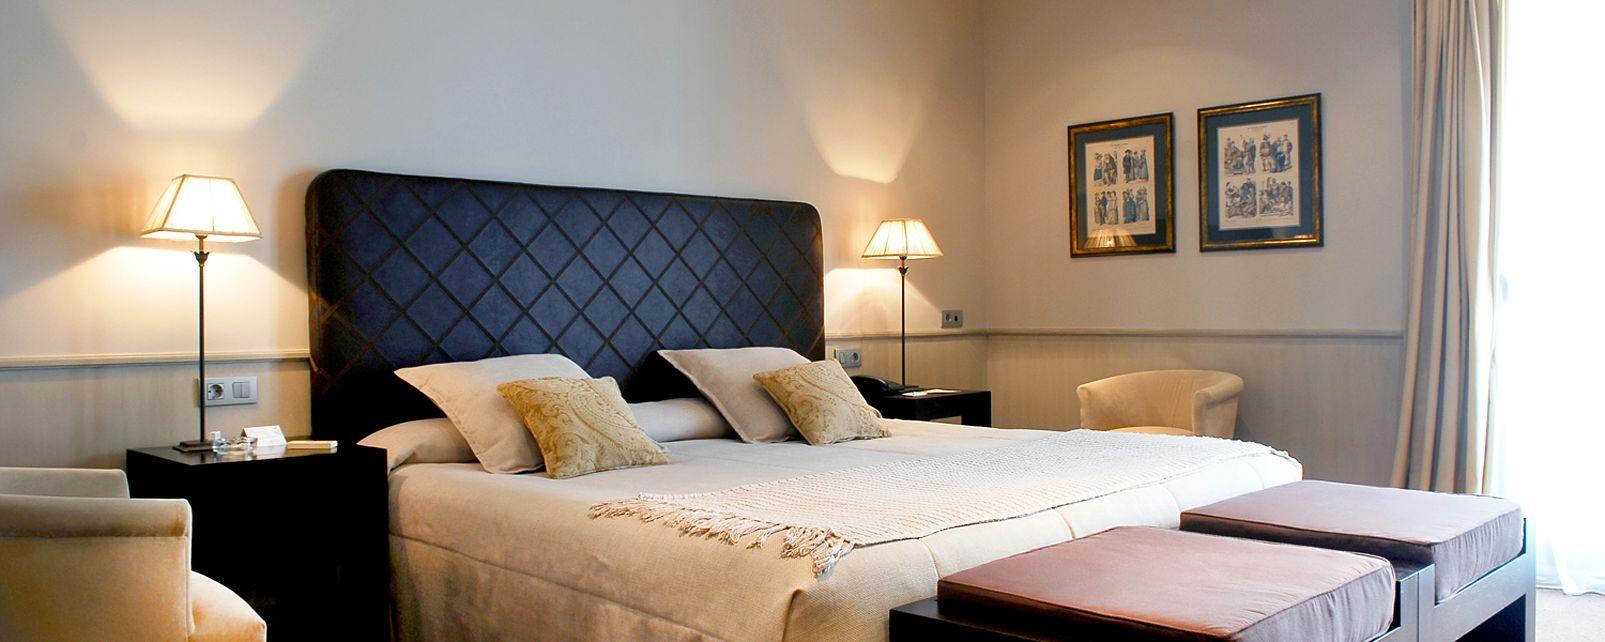 Hotel duquesa de cardona in - Hotel duques de cardona ...